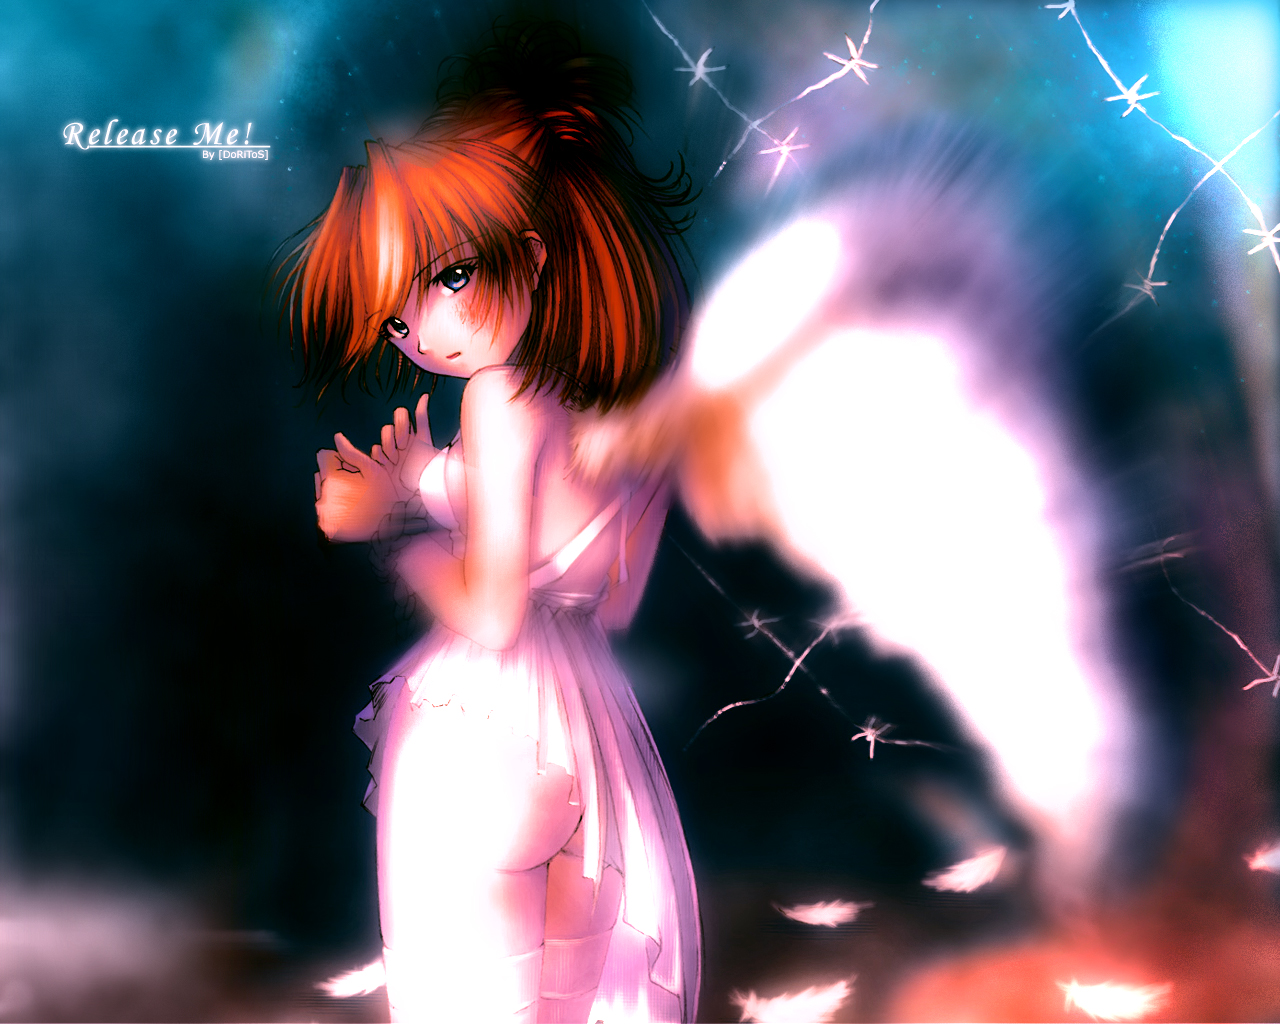 kobayashi_yuji neon_genesis_evangelion soryu_asuka_langley wings